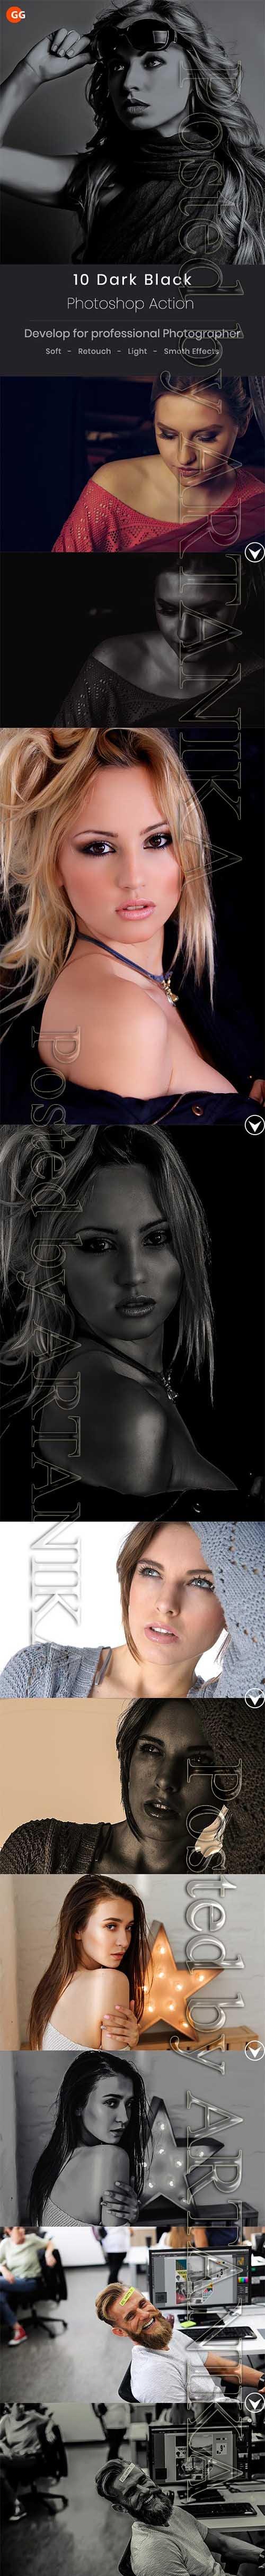 GraphicRiver - 10 Dark Black Photoshop Action 21400696